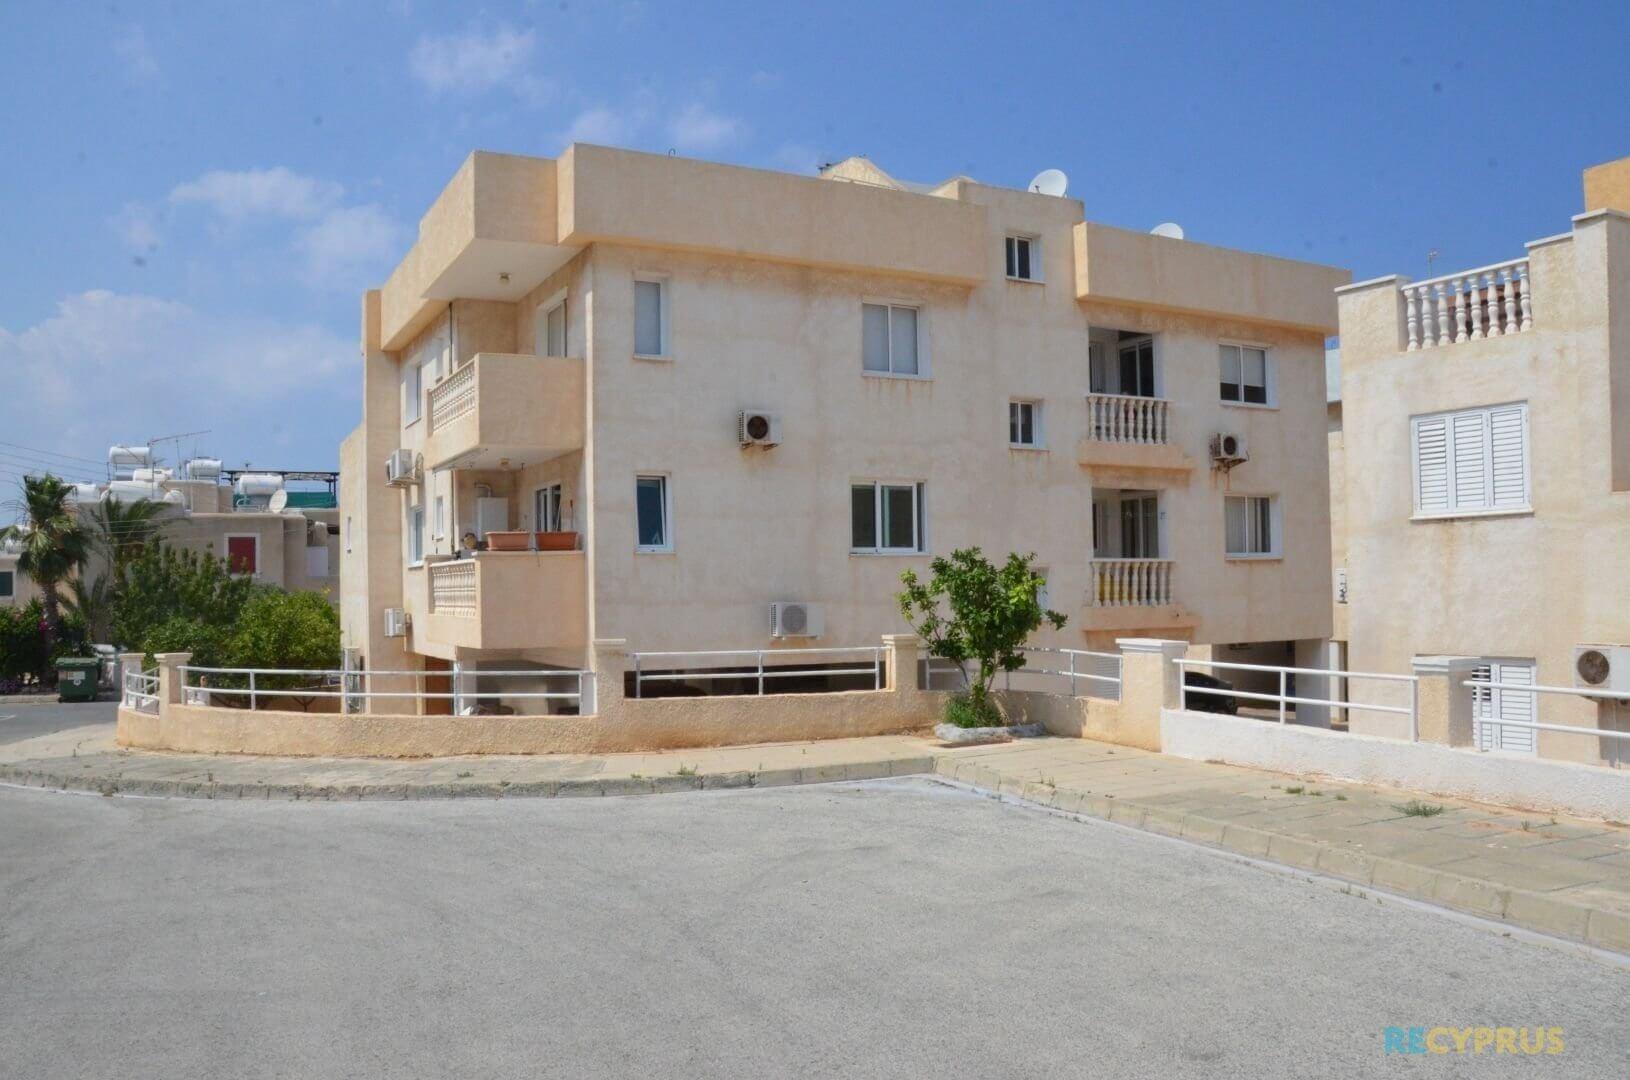 Apartment for sale Kapparis Famagusta Cyprus 1 3518